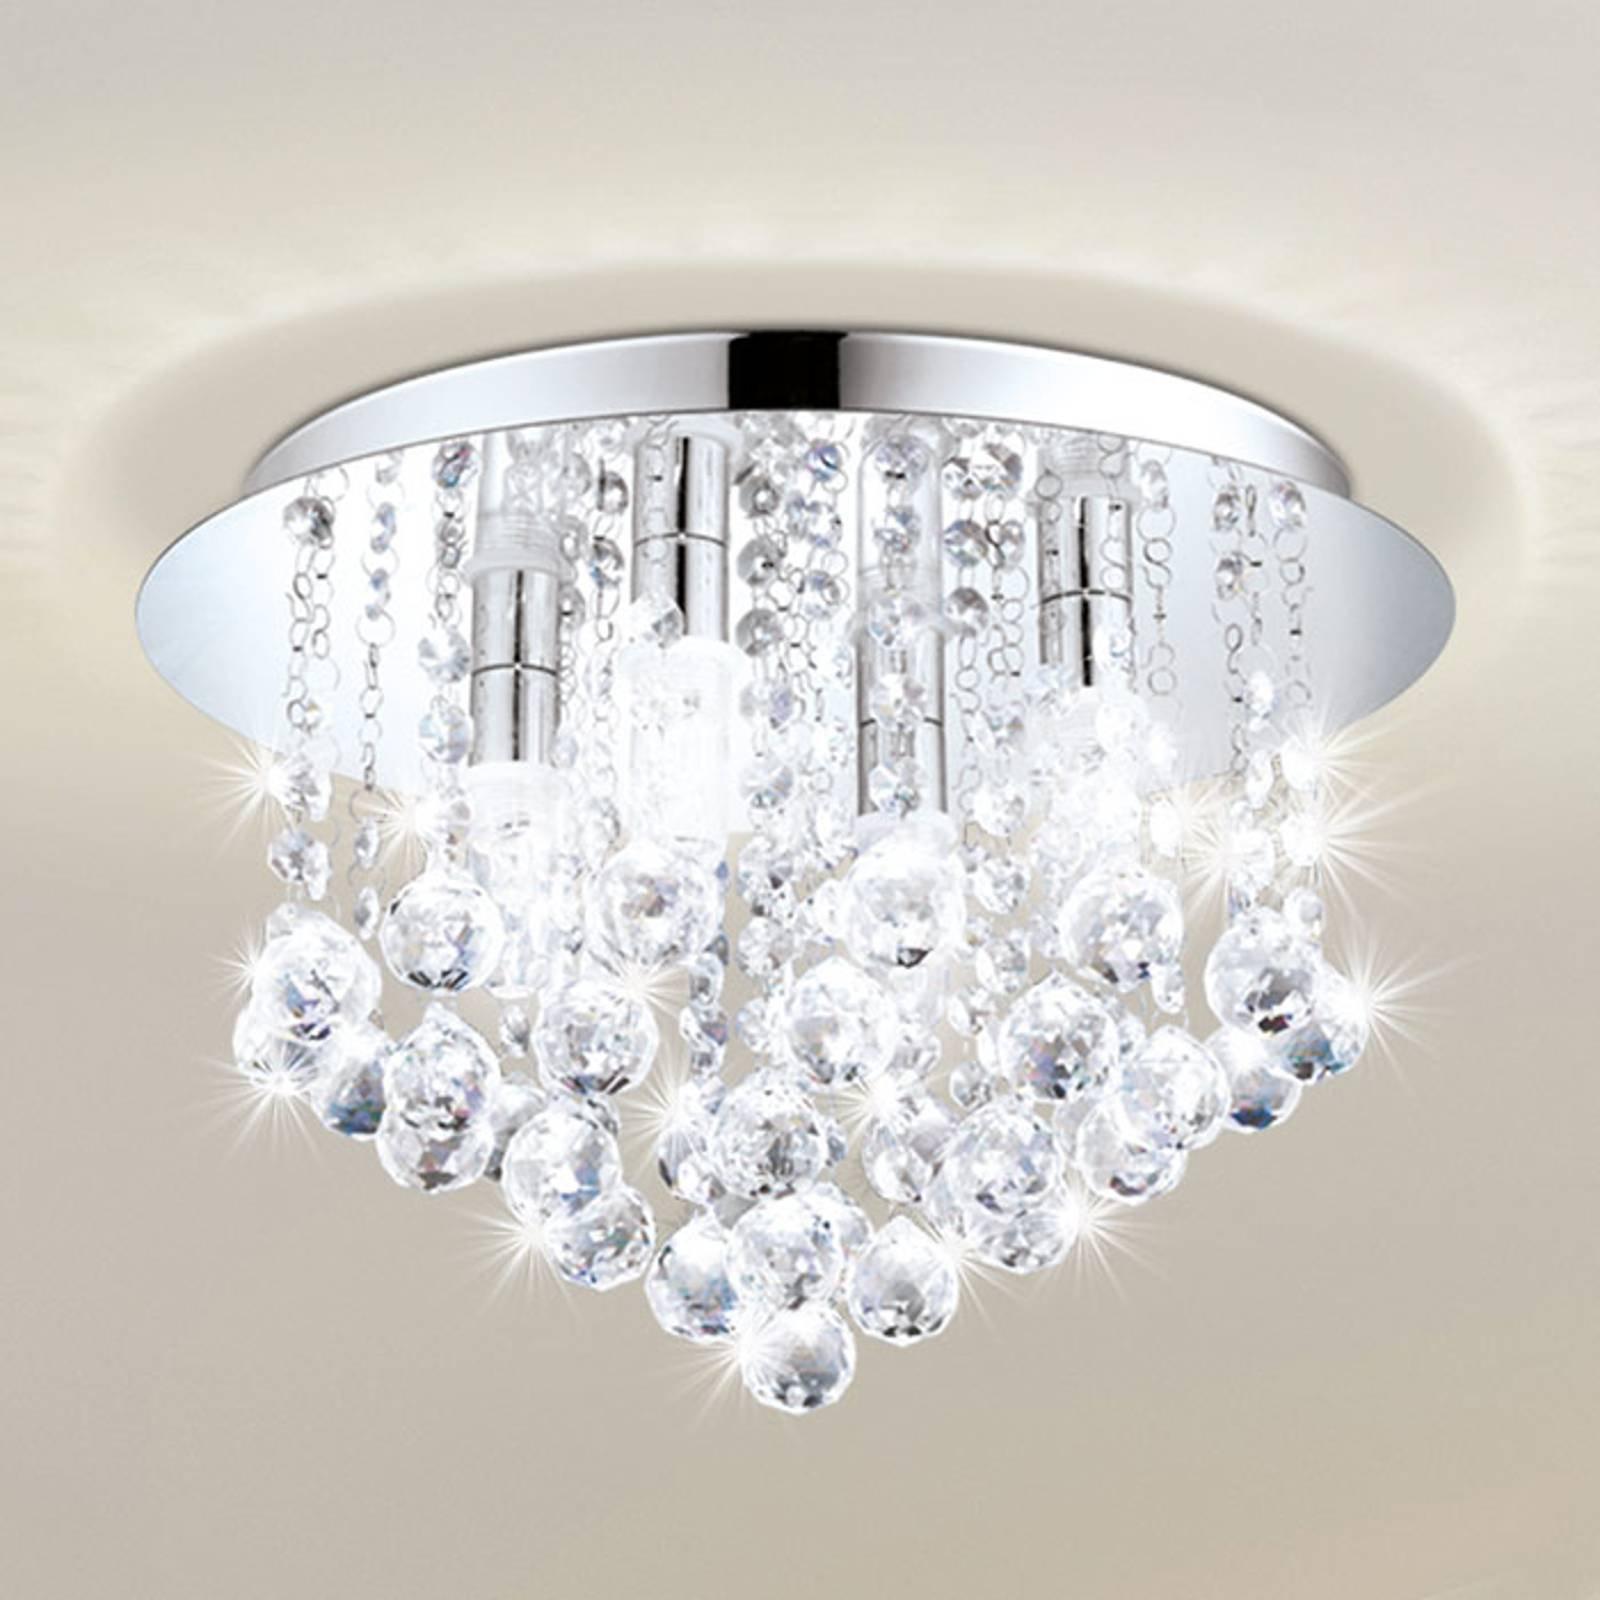 LED-taklampe Almonte med forheng 50 cm